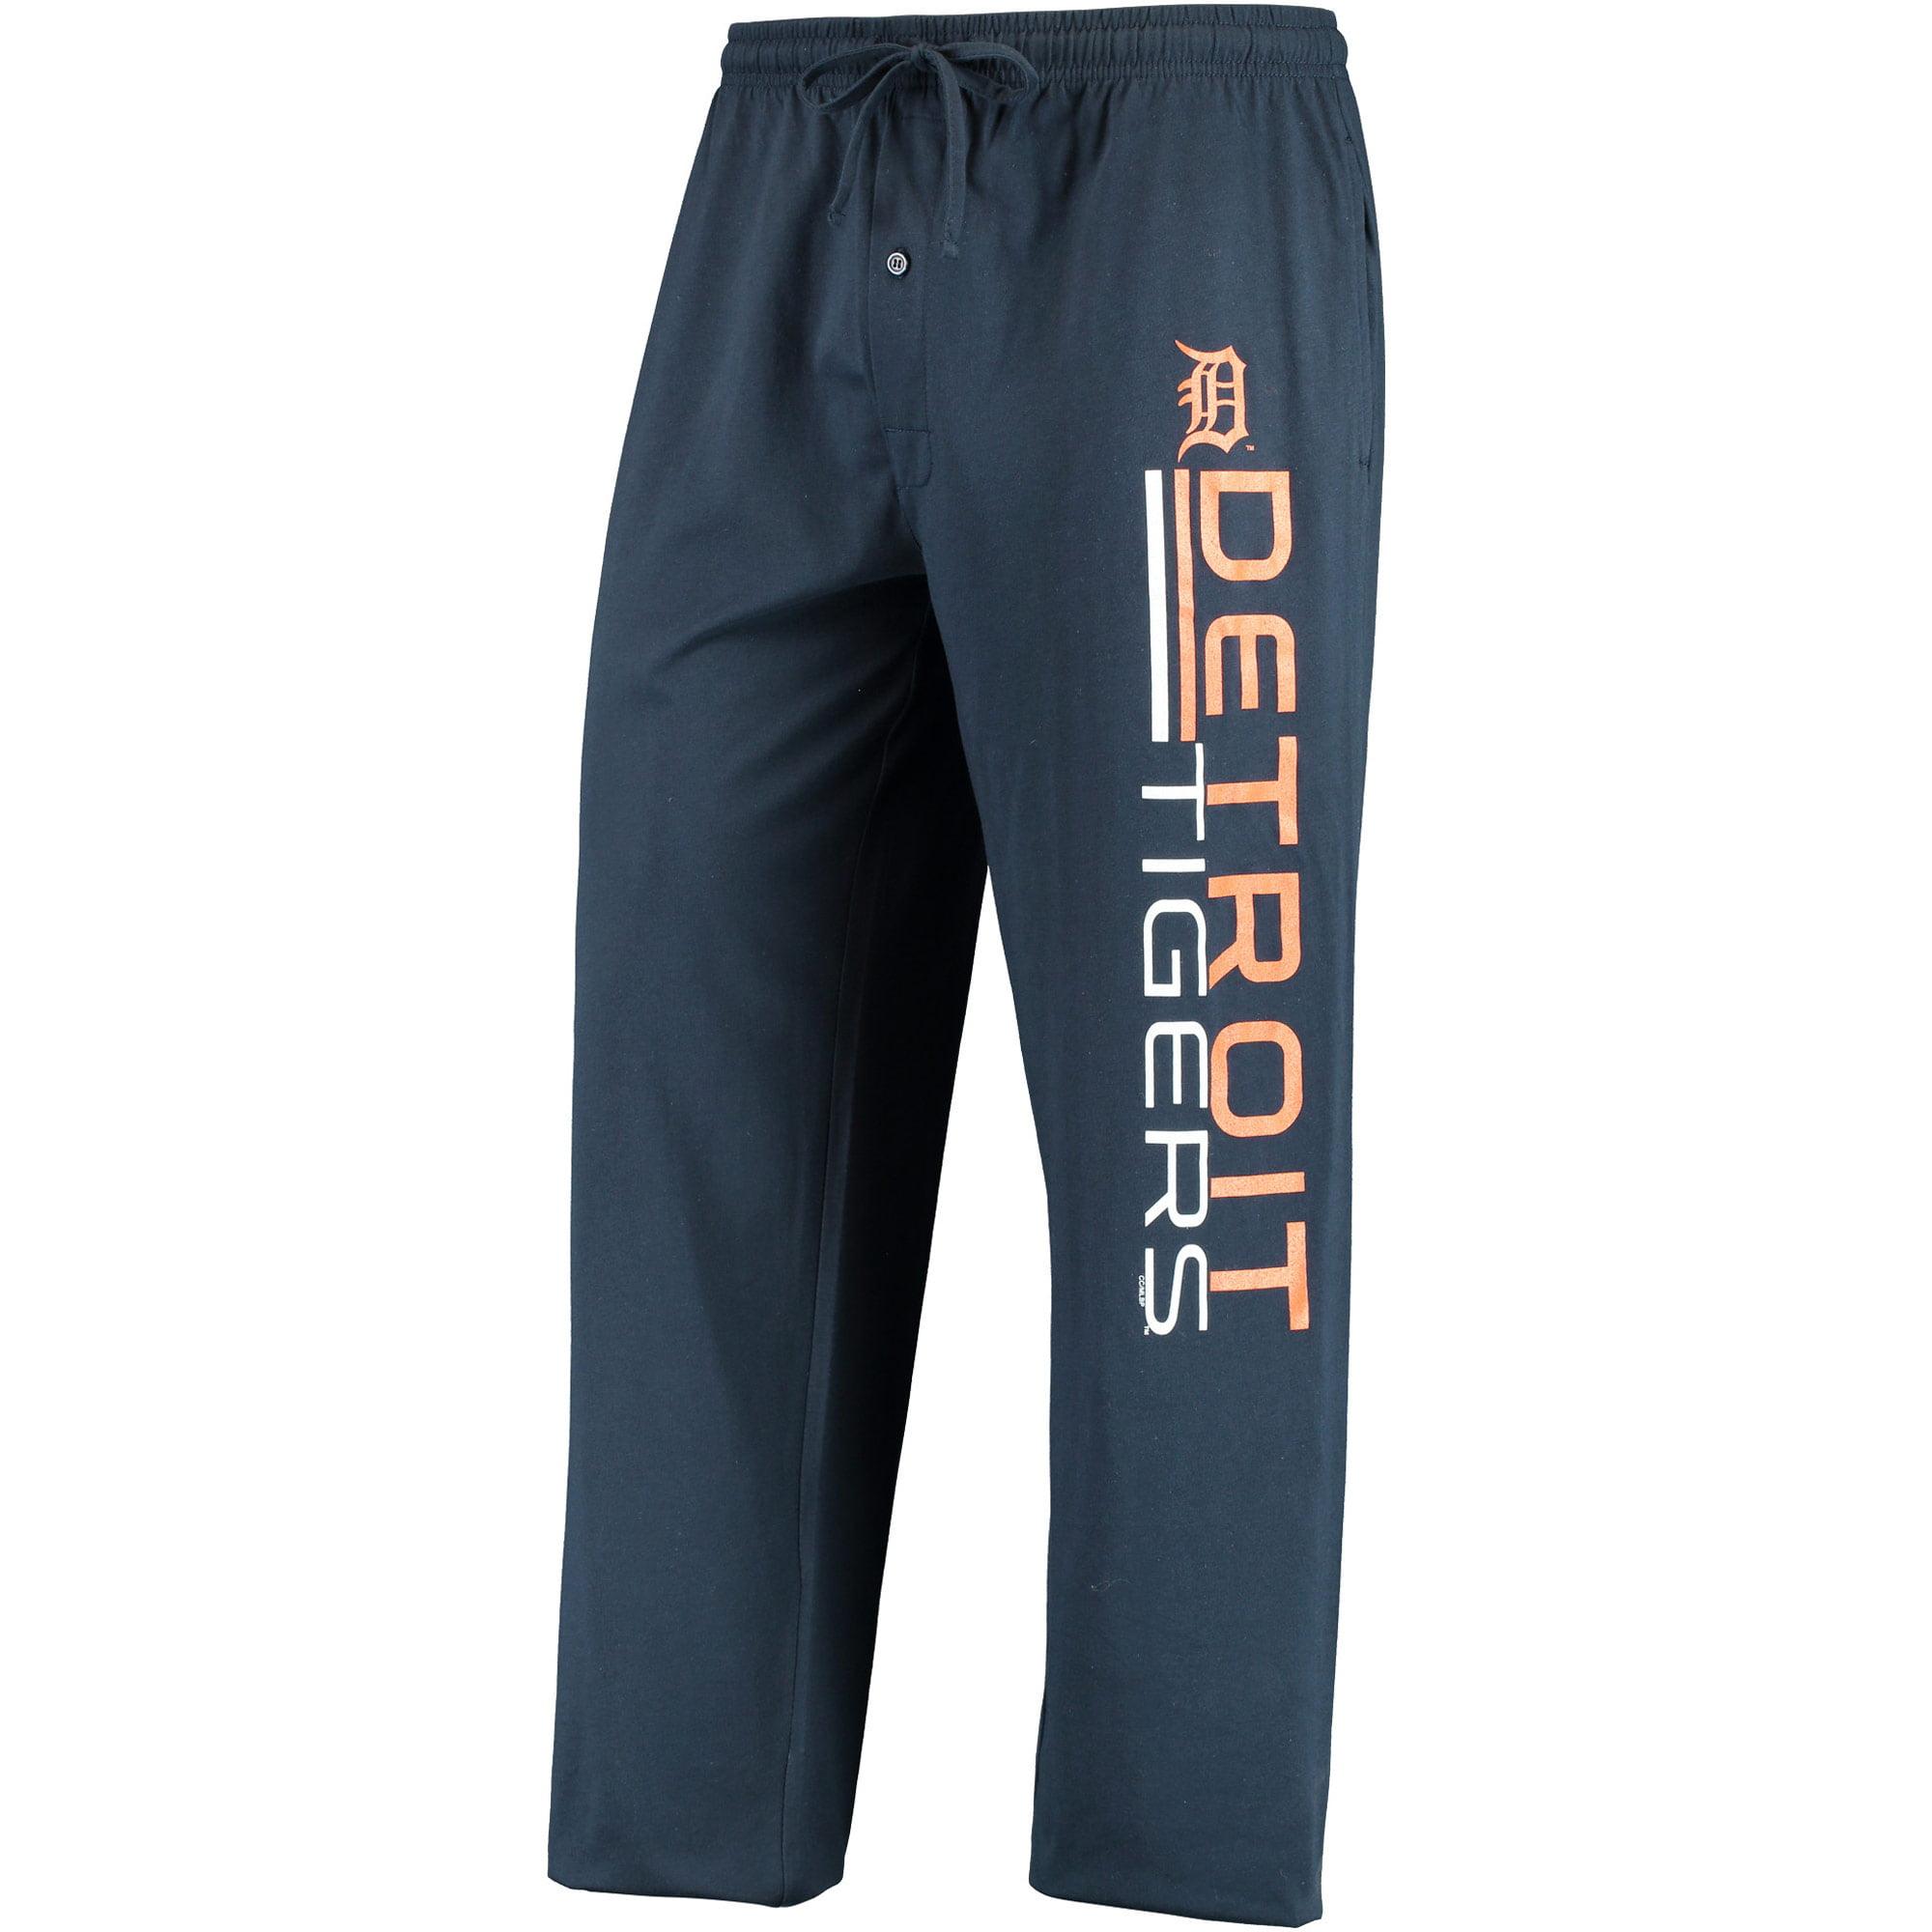 Detroit Tigers Concepts Sport NBO Knit Pants - Navy